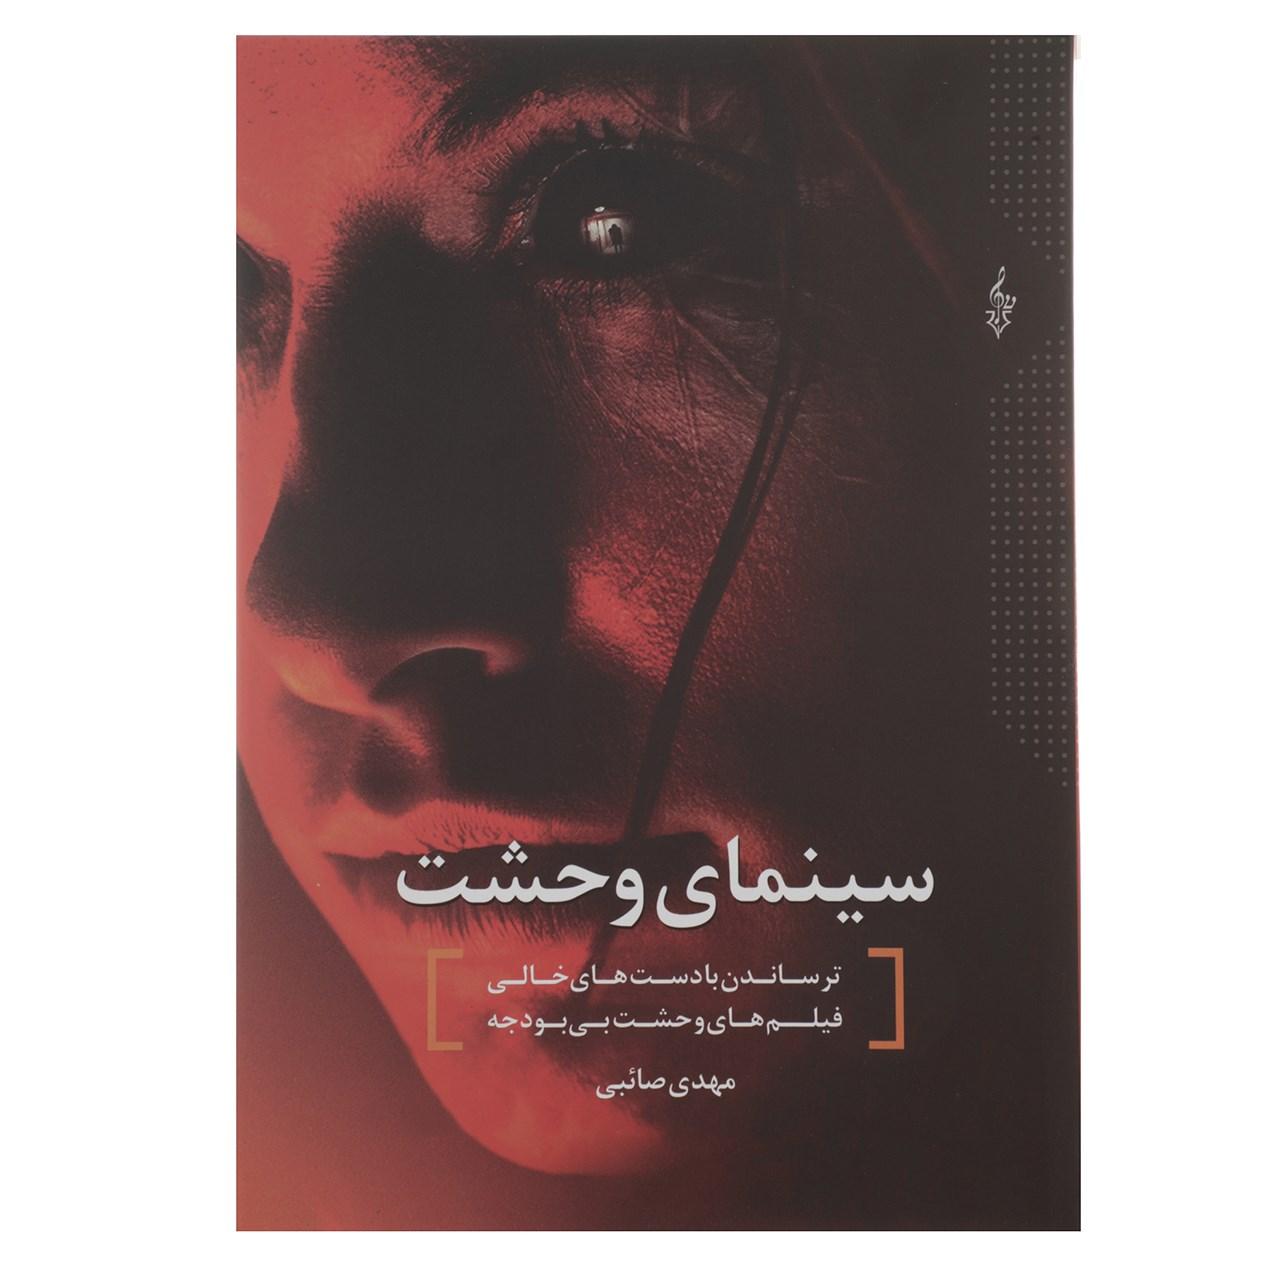 کتاب سینمای وحشت اثر مهدی صائبی